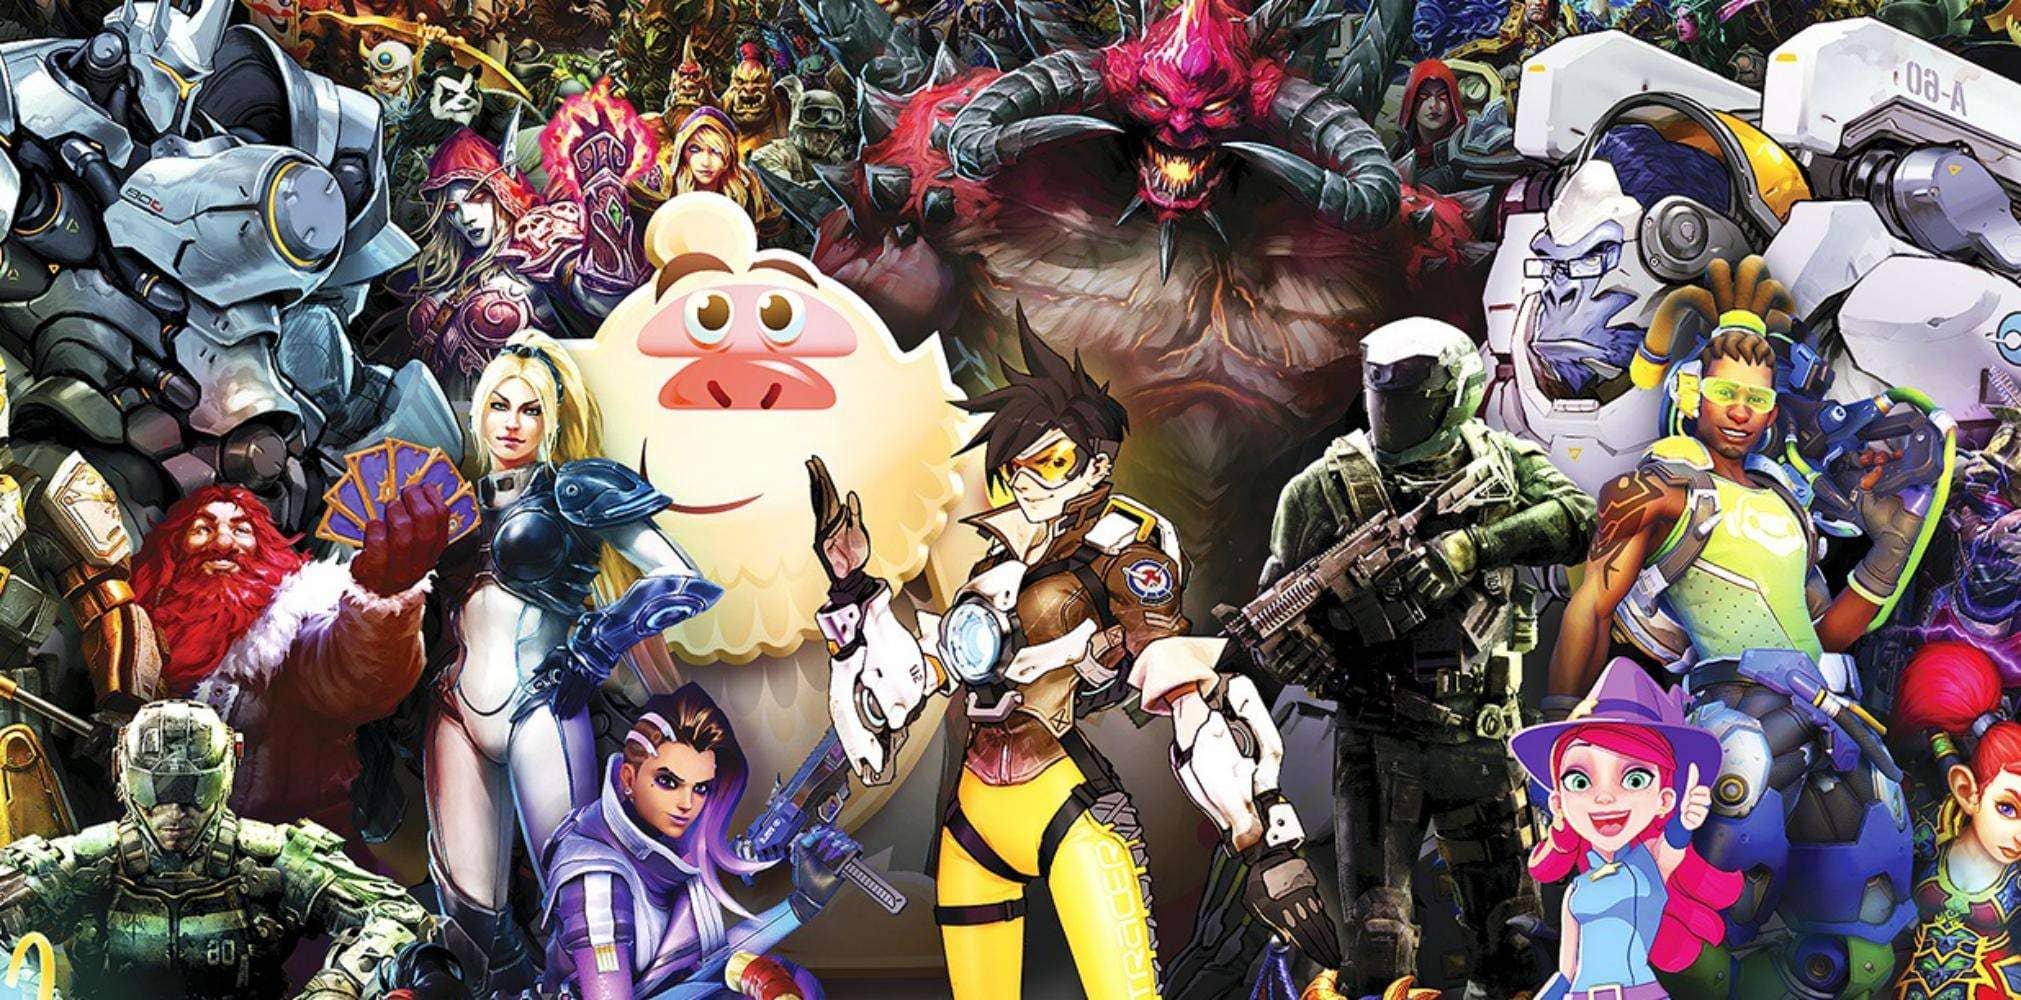 Компании Square Inc. и Activision Blizzard во время пандемии